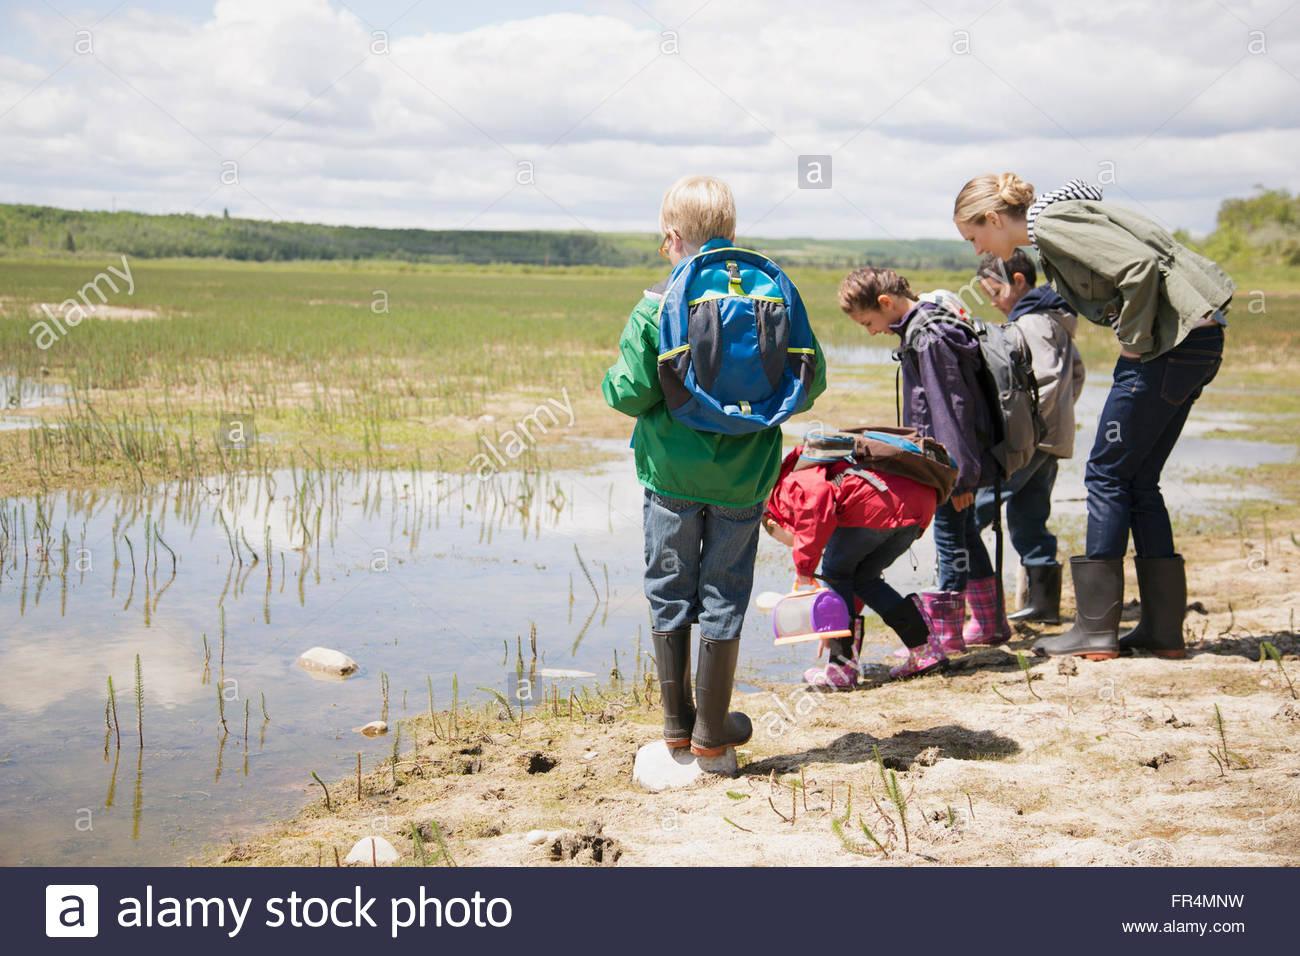 elementary school children on a field trip Stock Photo